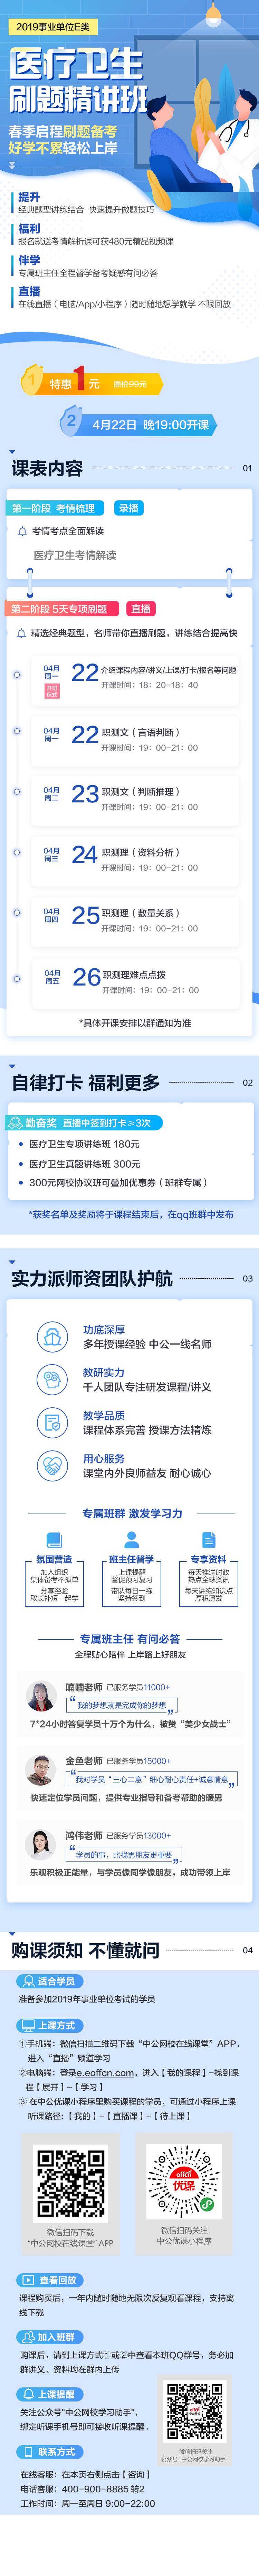 2019�t���l生E�刷�}精�v班.png